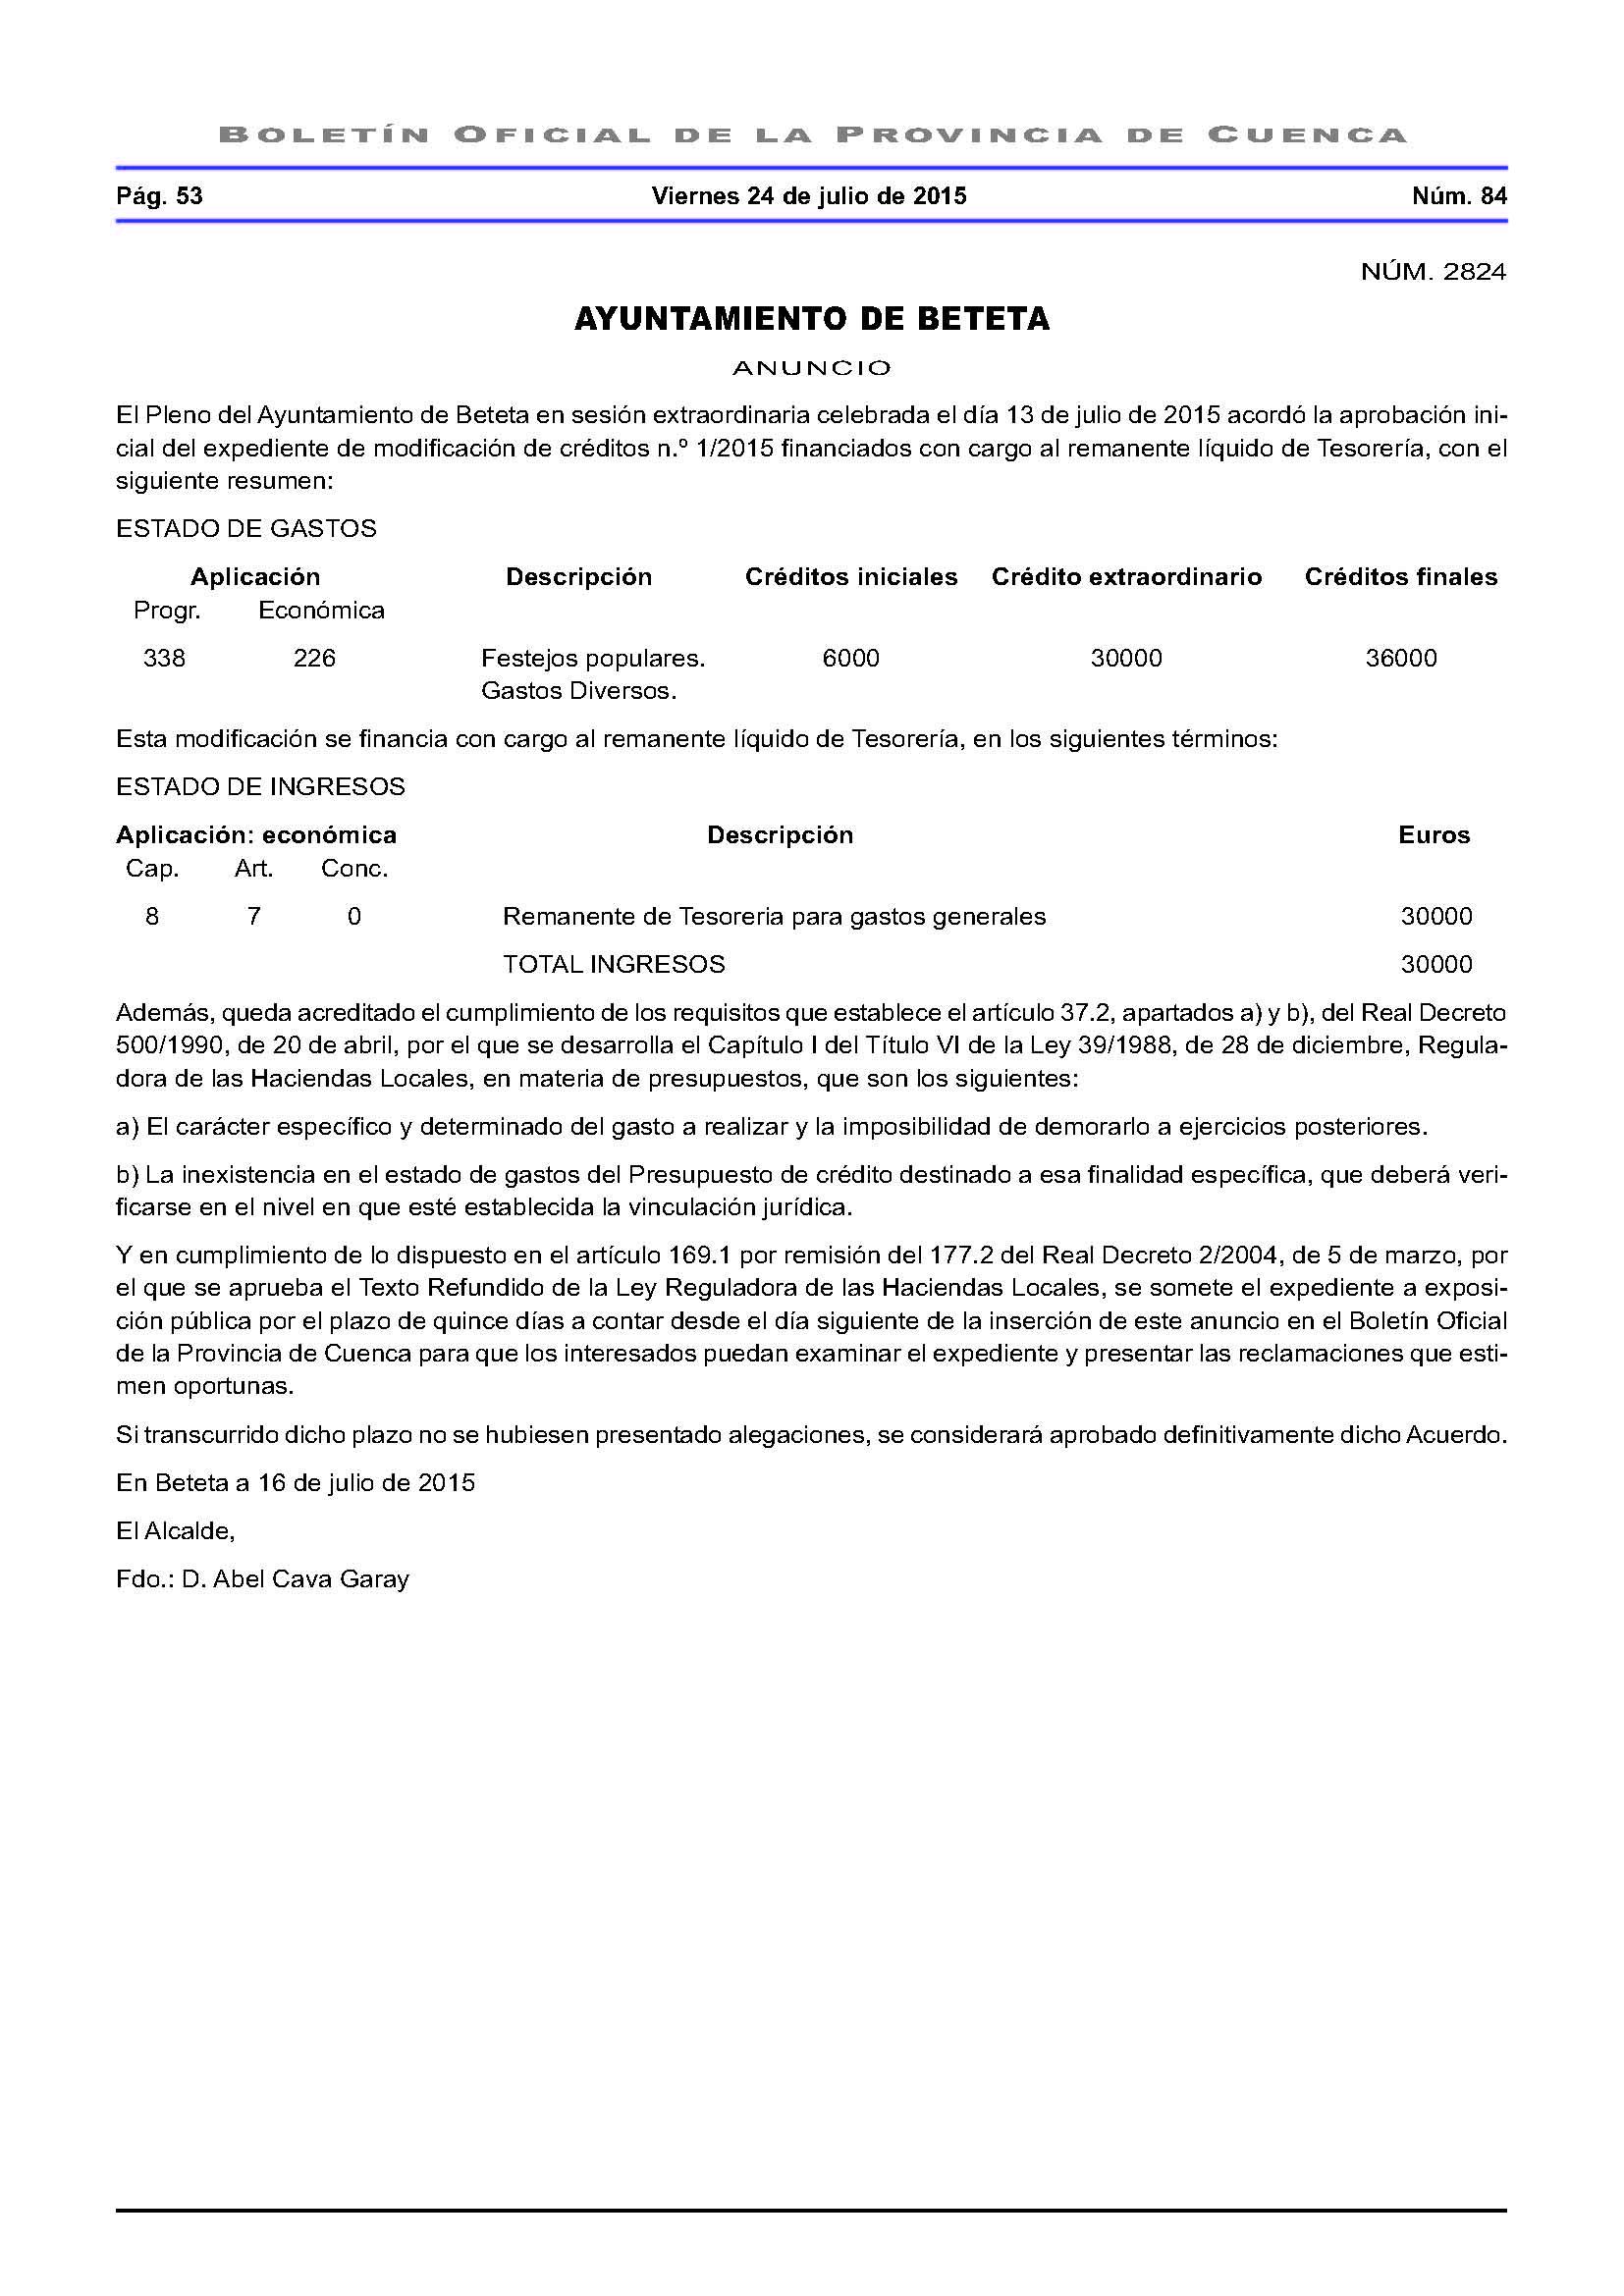 -bop-boletines-2015-7-24-28